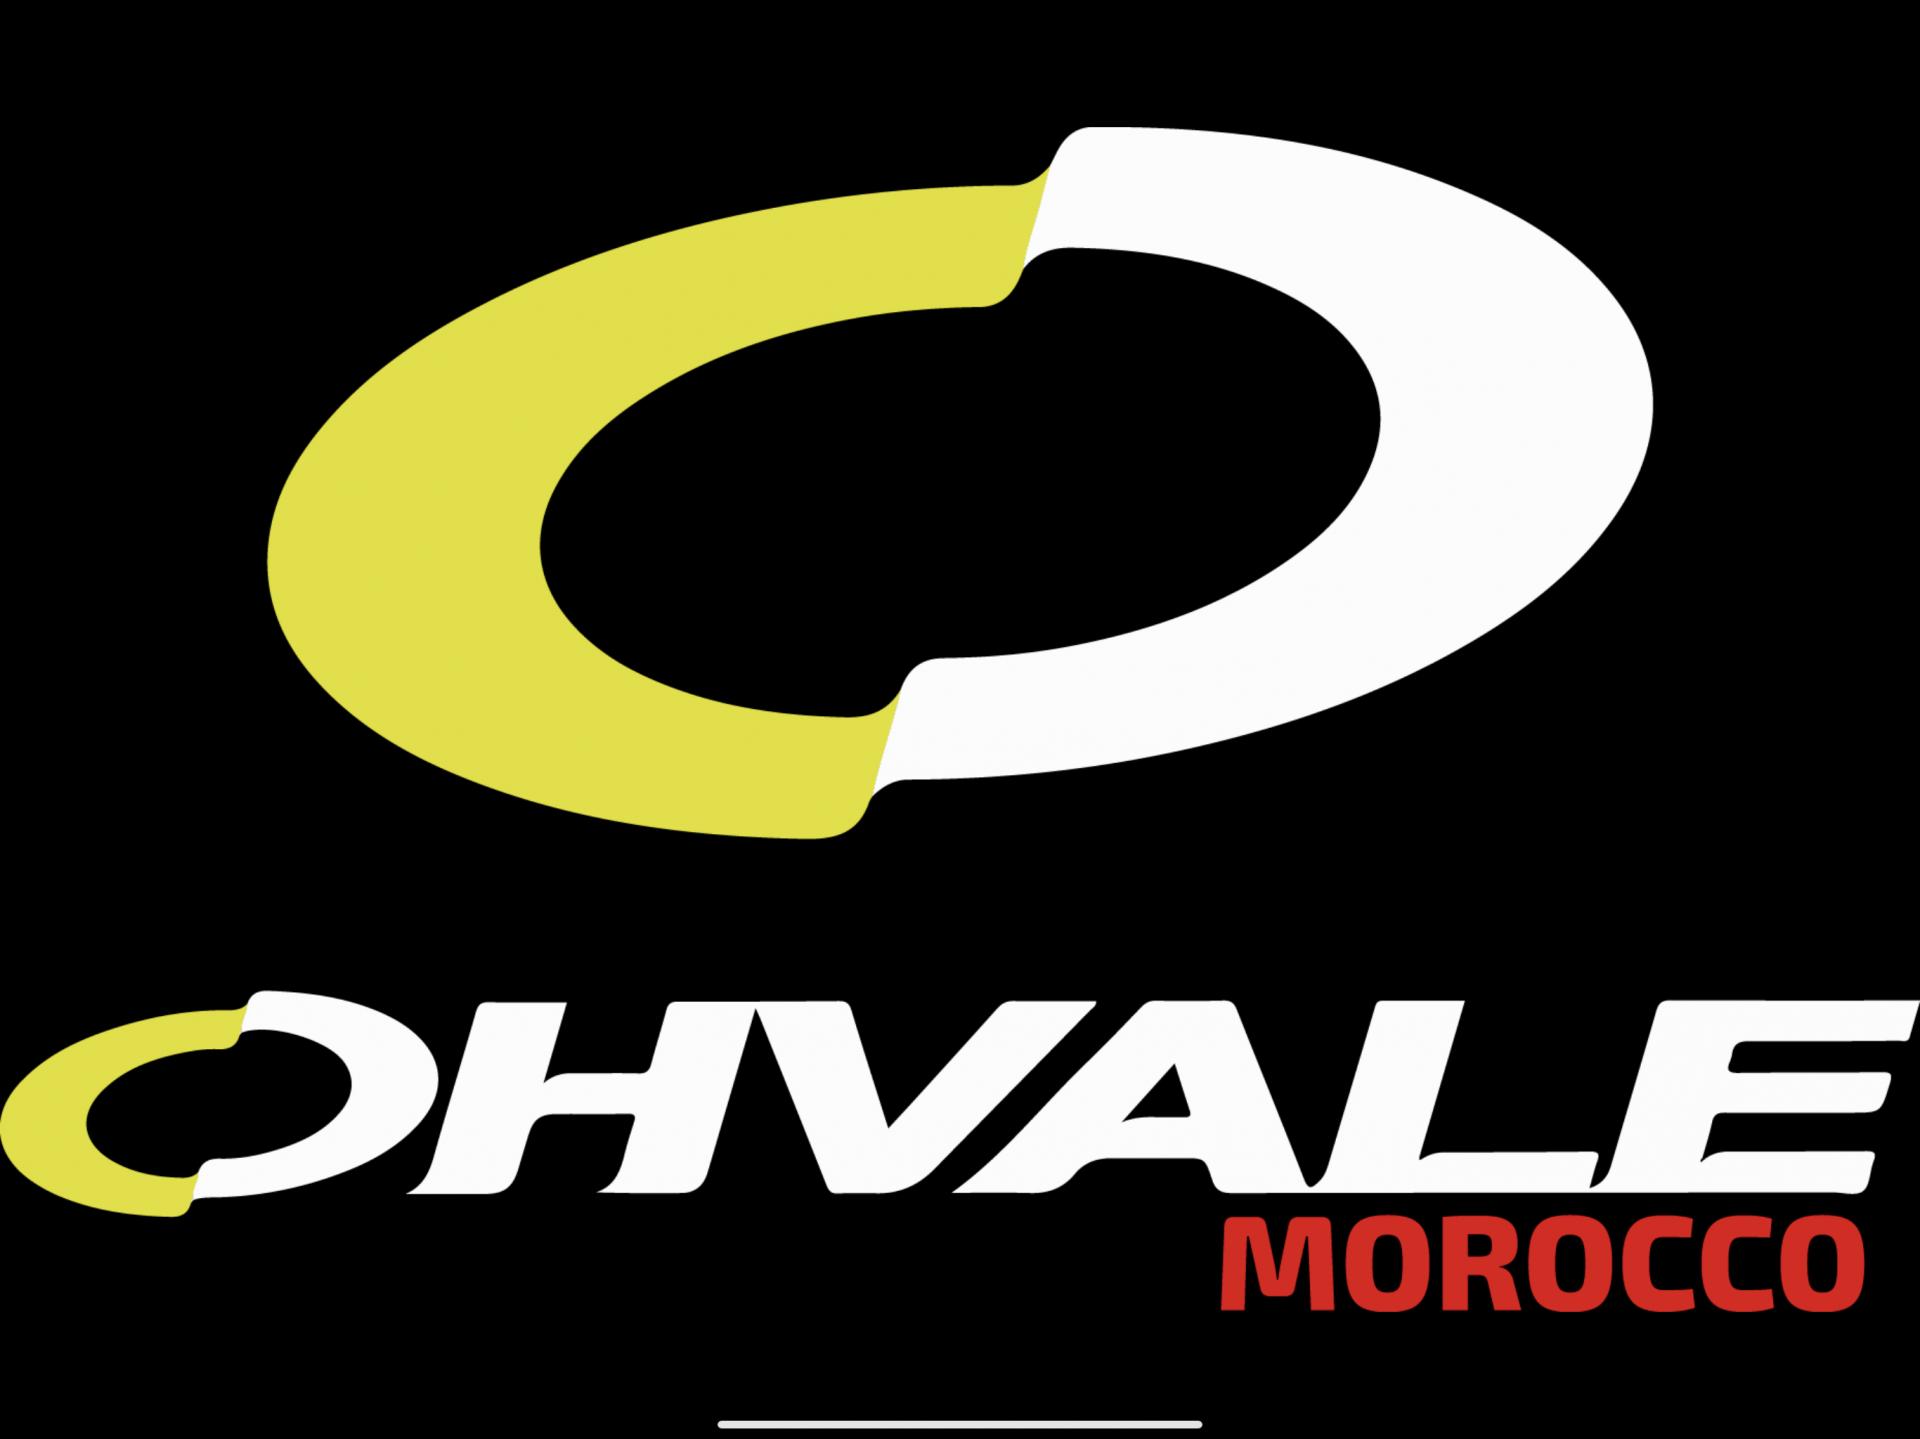 OHVALE Morocco logo